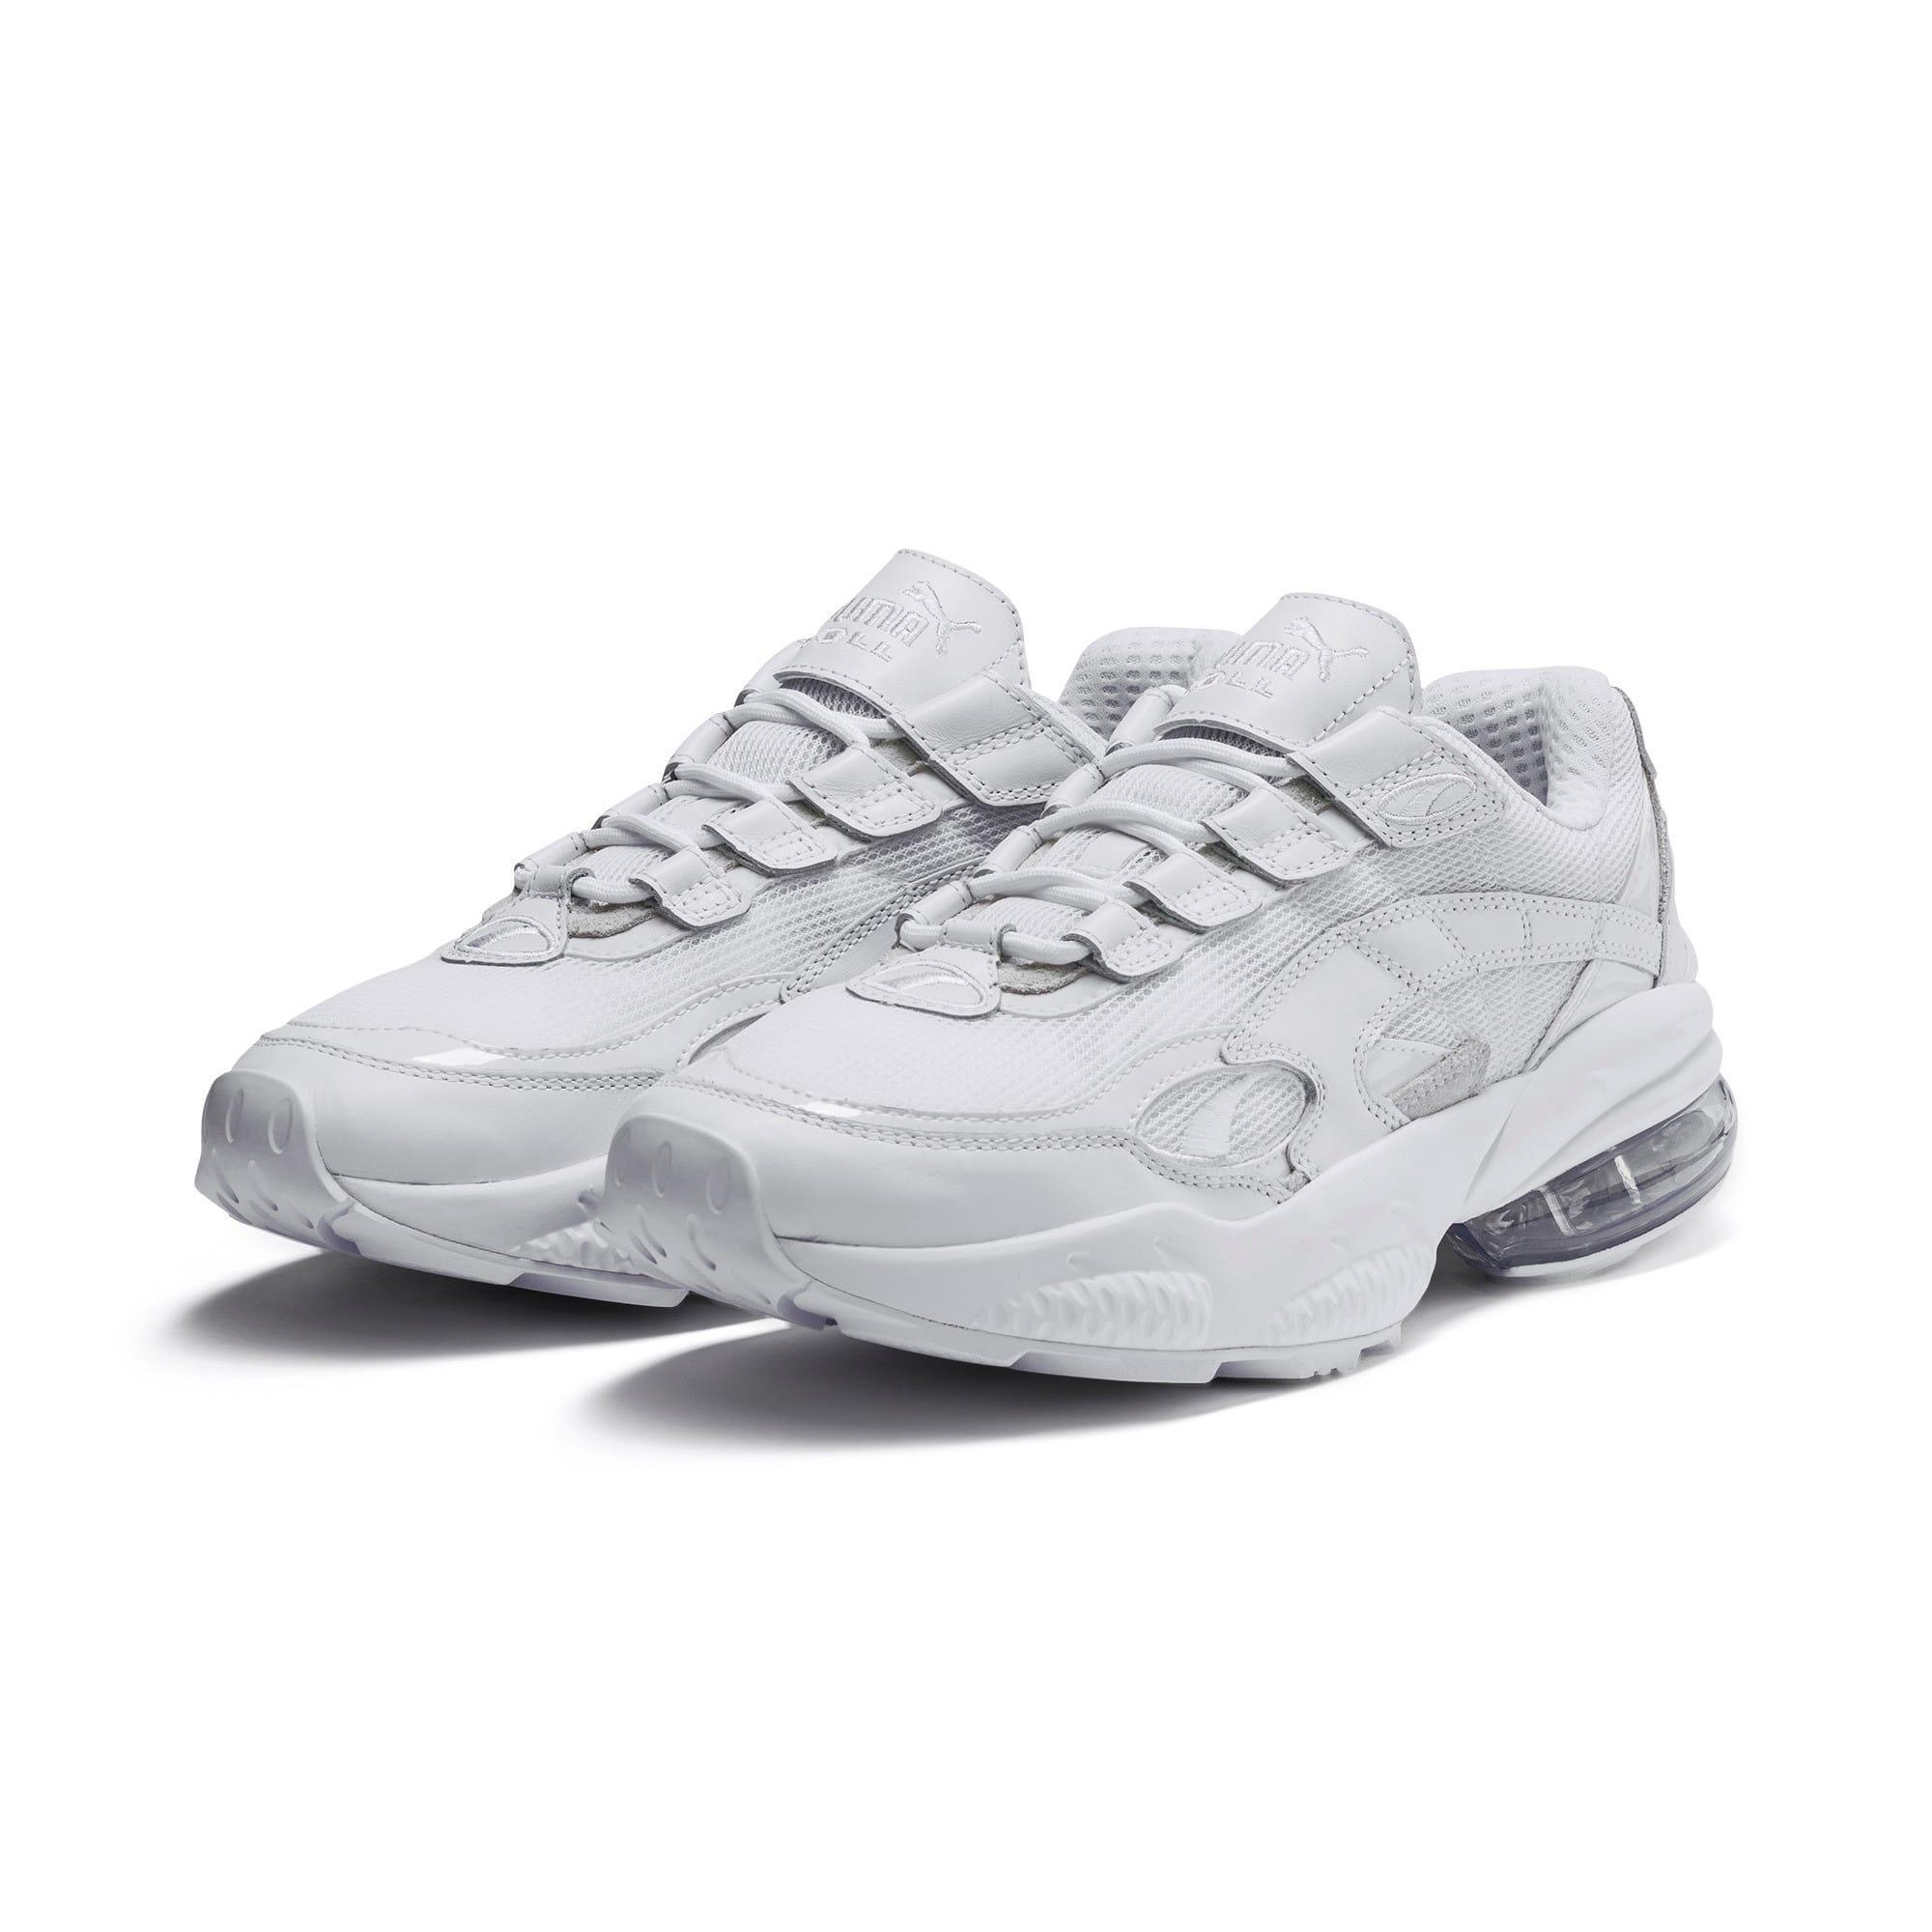 Thumbnail 3 of CELL Venom Reflective Sneakers, Puma White-Puma White, medium